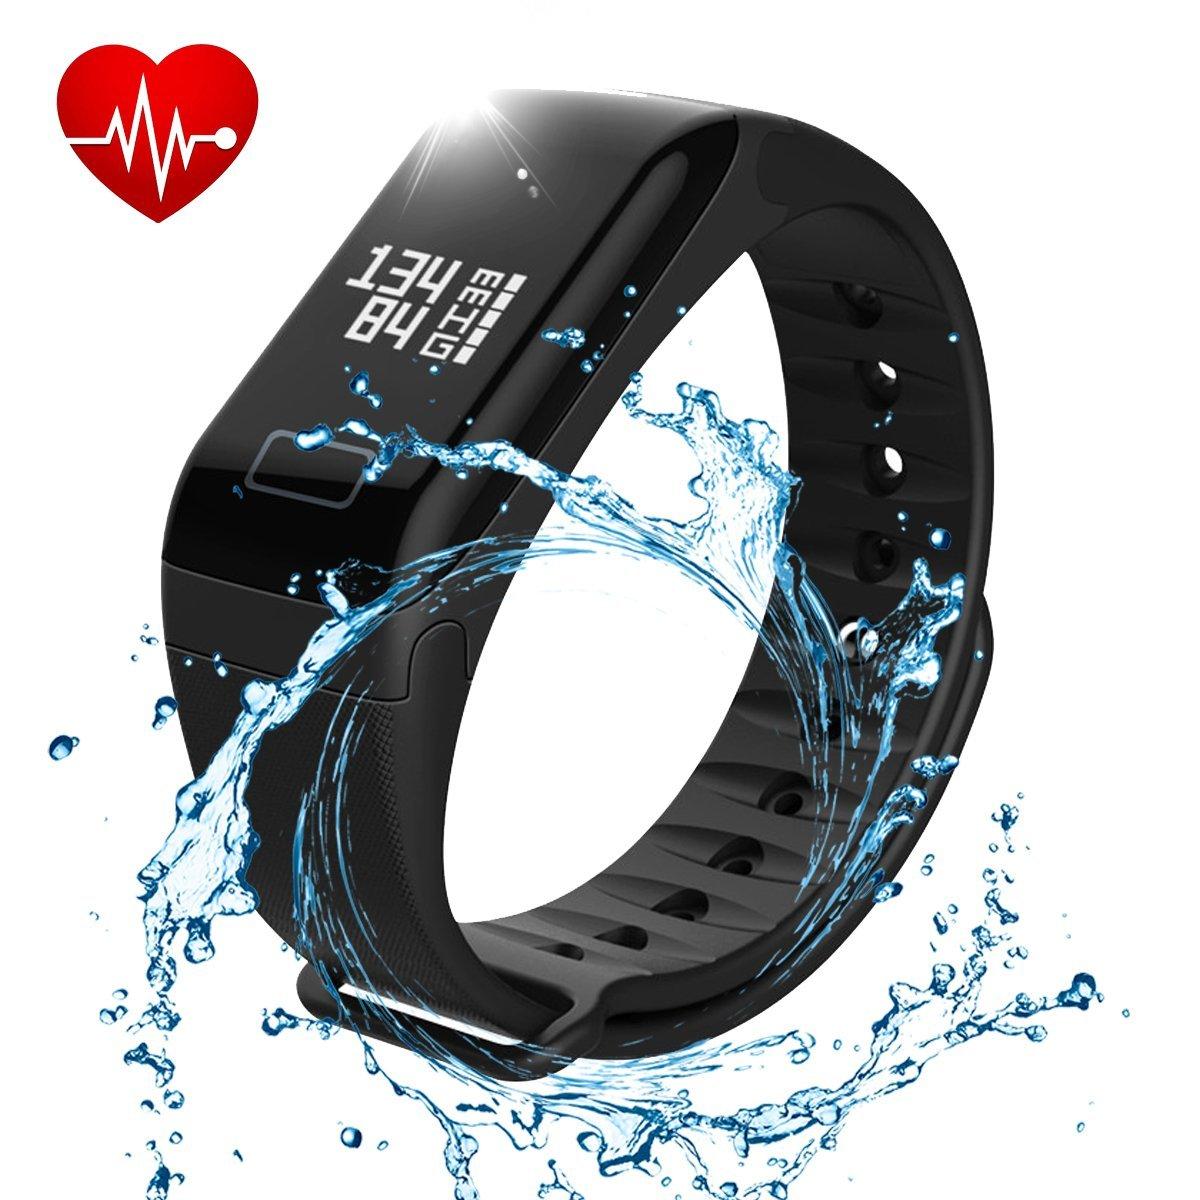 hot-sale-font-b-f1-b-font-smart-band-intelligent-bracelet-fitness-tracker-heart-rate-blood-pressure-monitor-smart-watch-waterproof-wristband